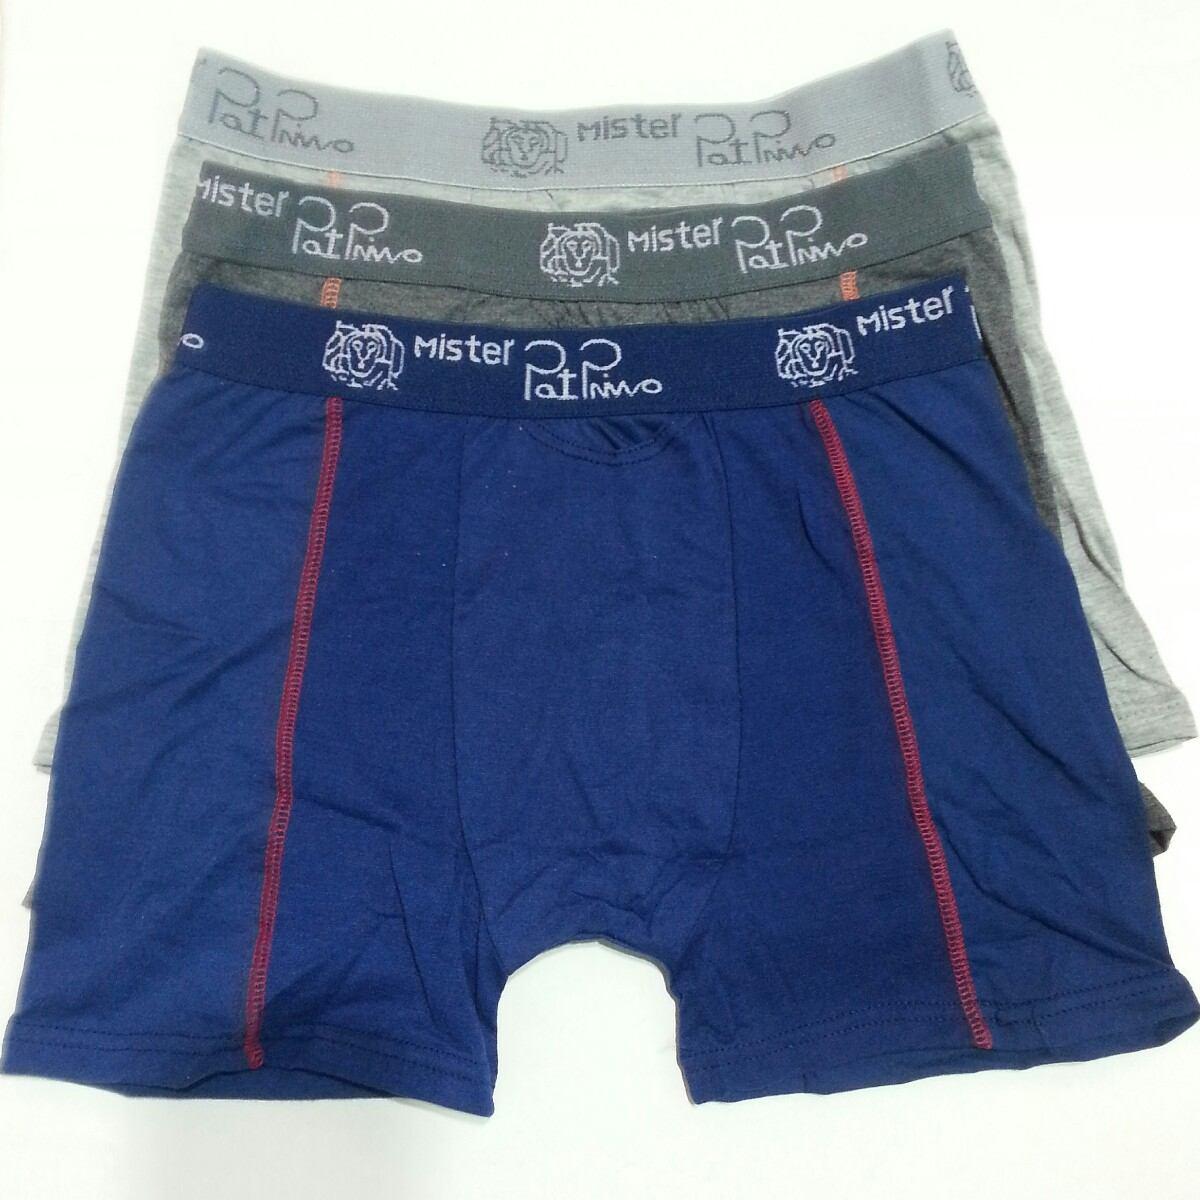 Boxer pat primo ropa interior talla m l xl xxl tienda fisica bs 1 49 en mercado libre - Ropa interior xxl ...